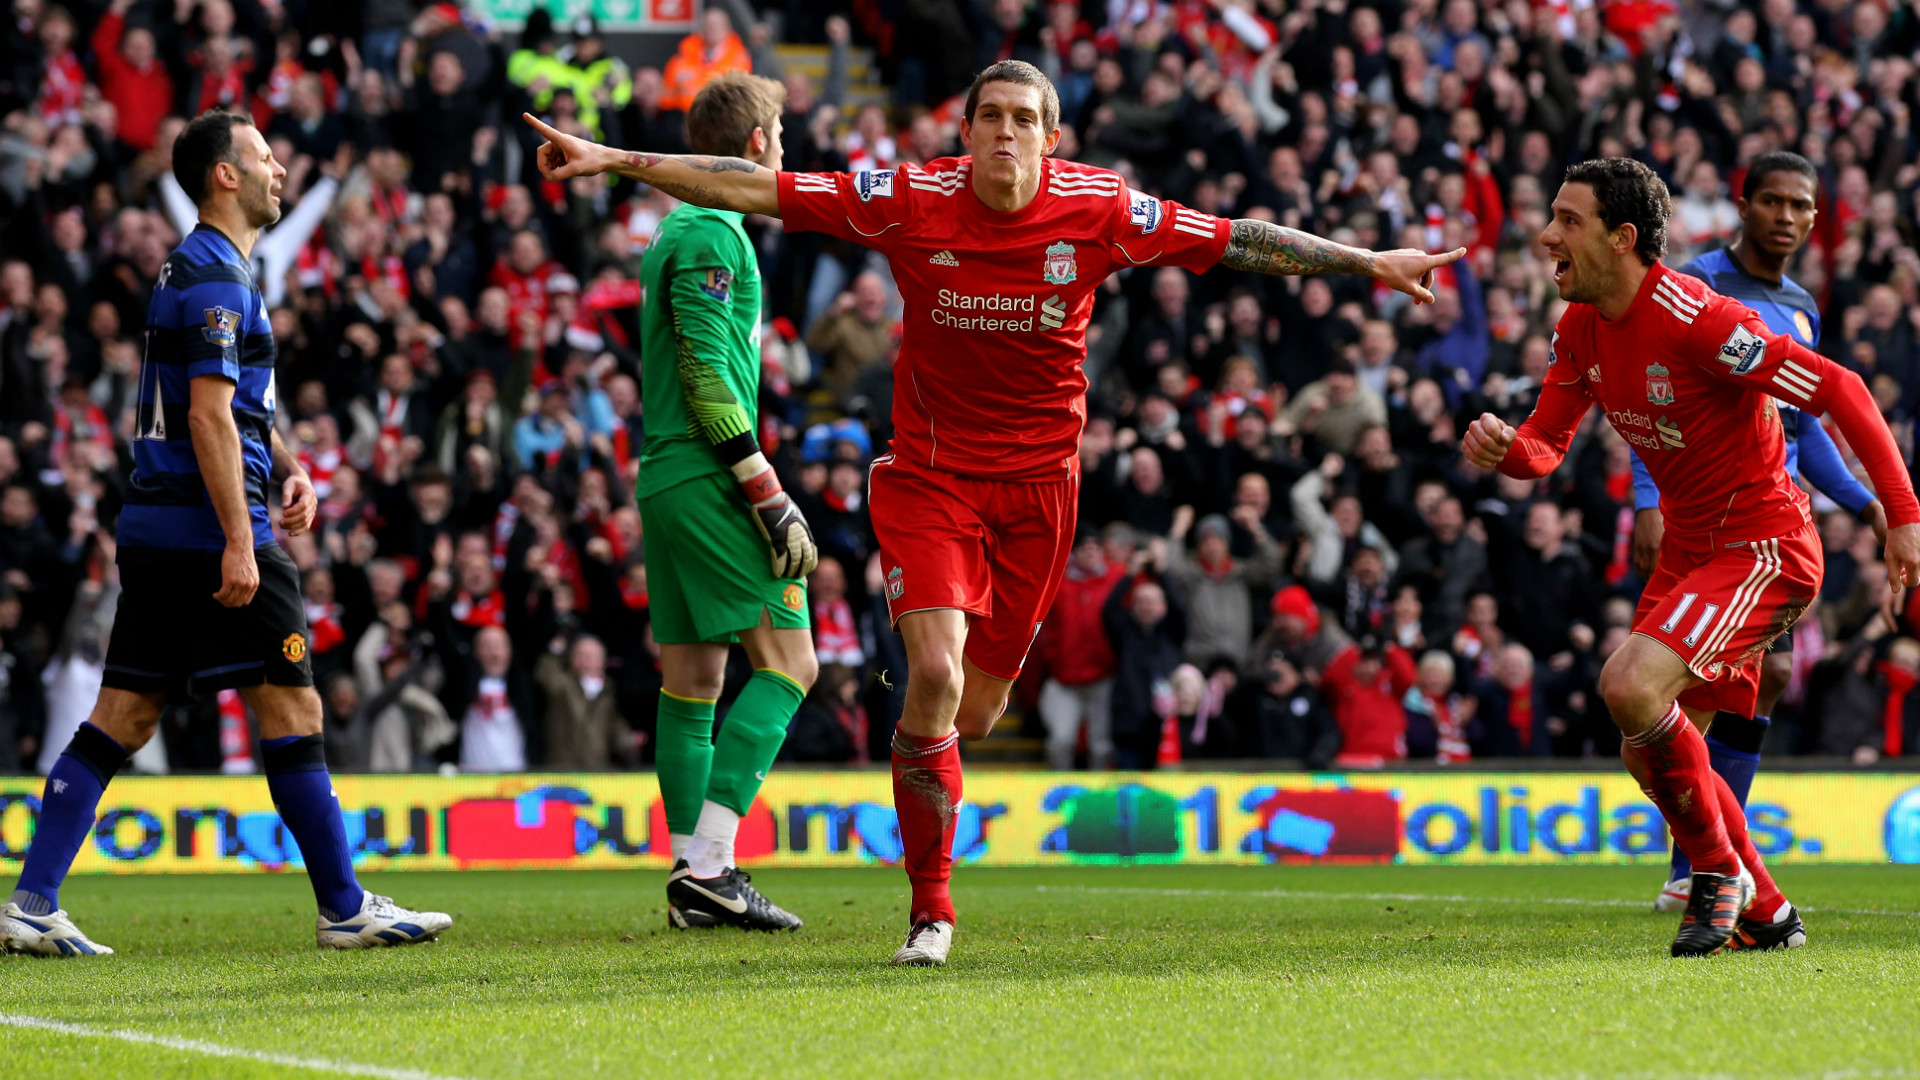 HD Daniel Agger goal v Man United